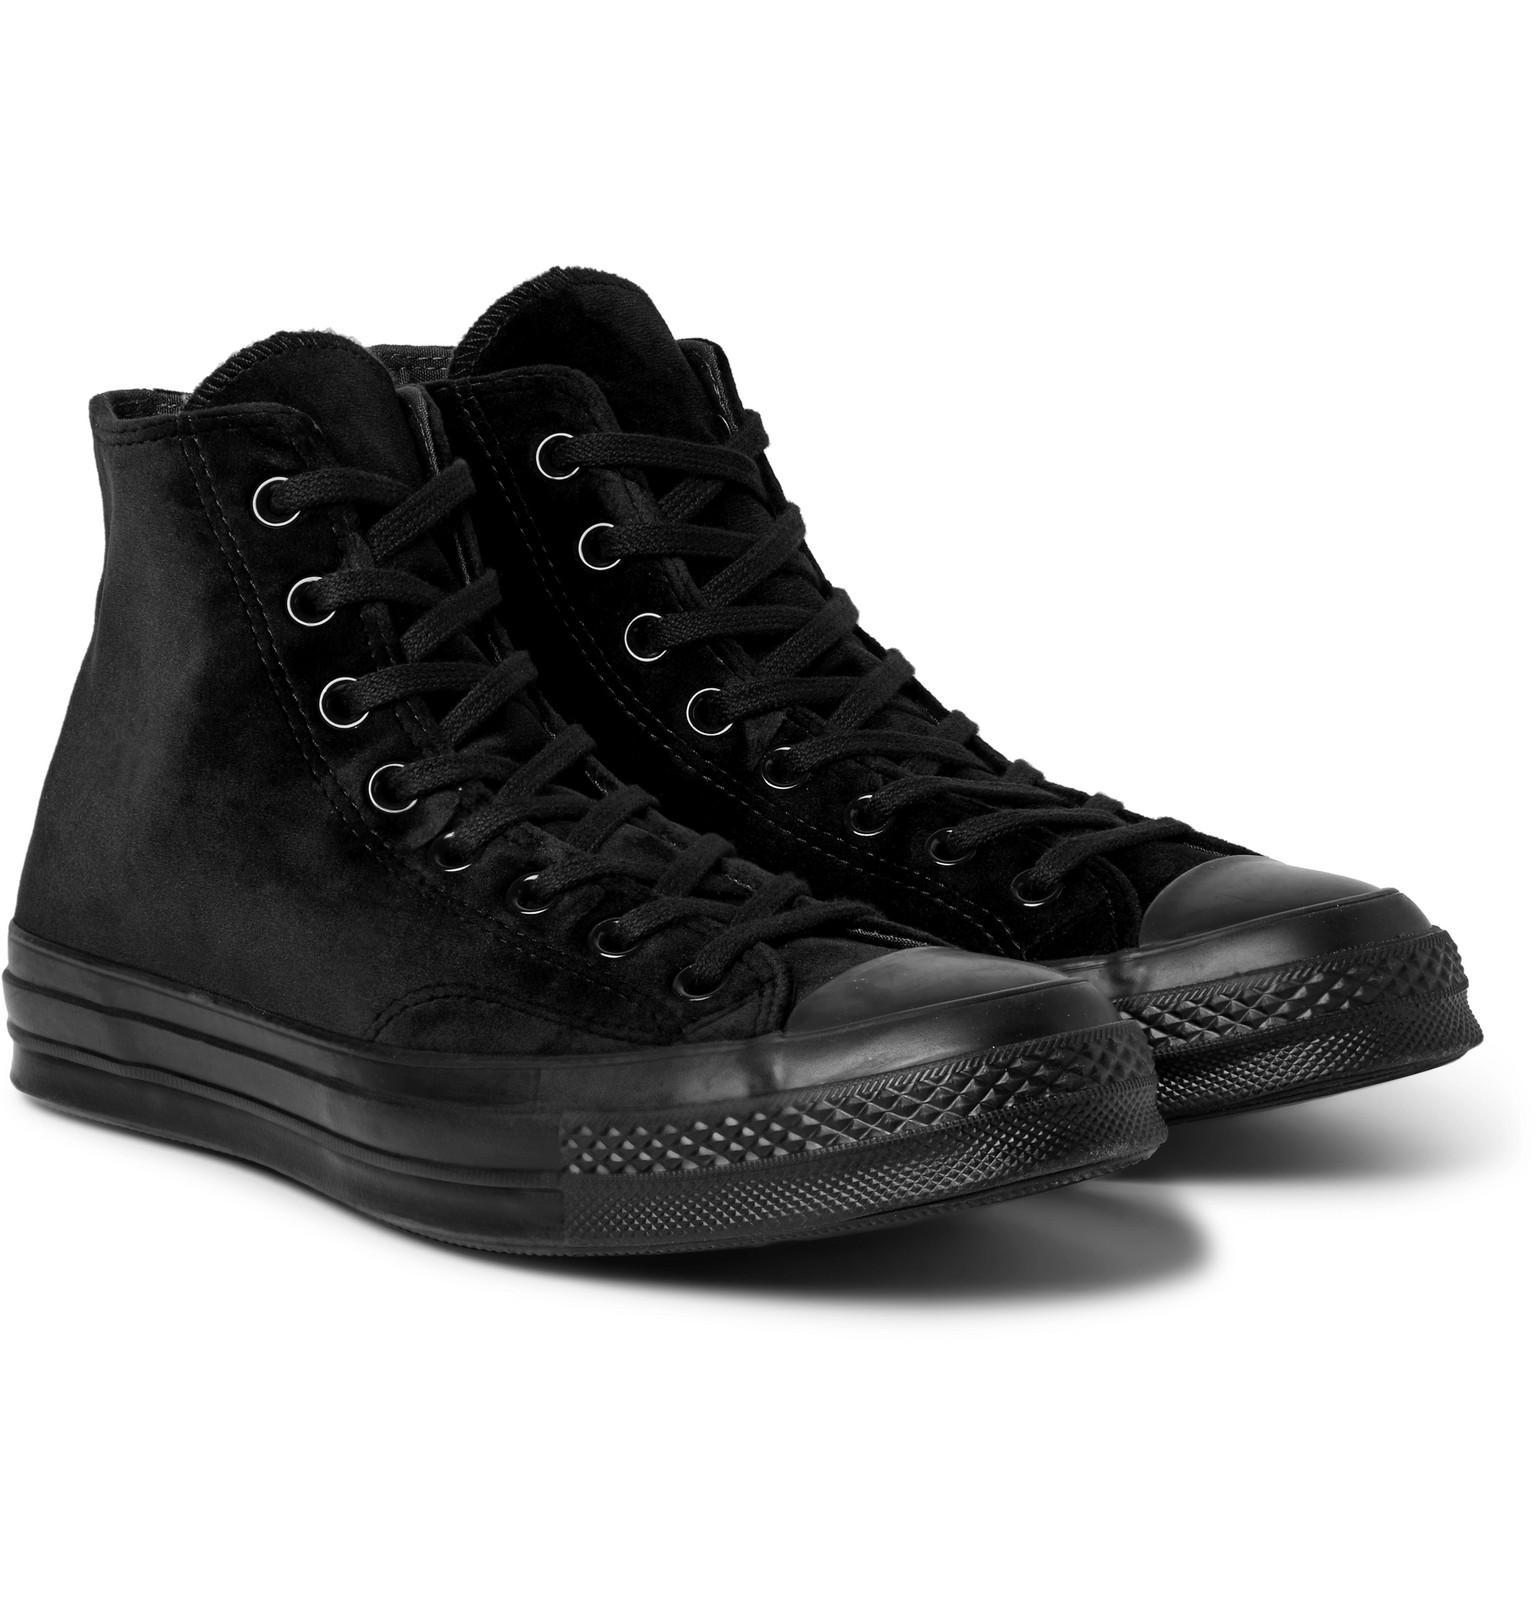 Converse Black Velvet Chuck 70 Hi